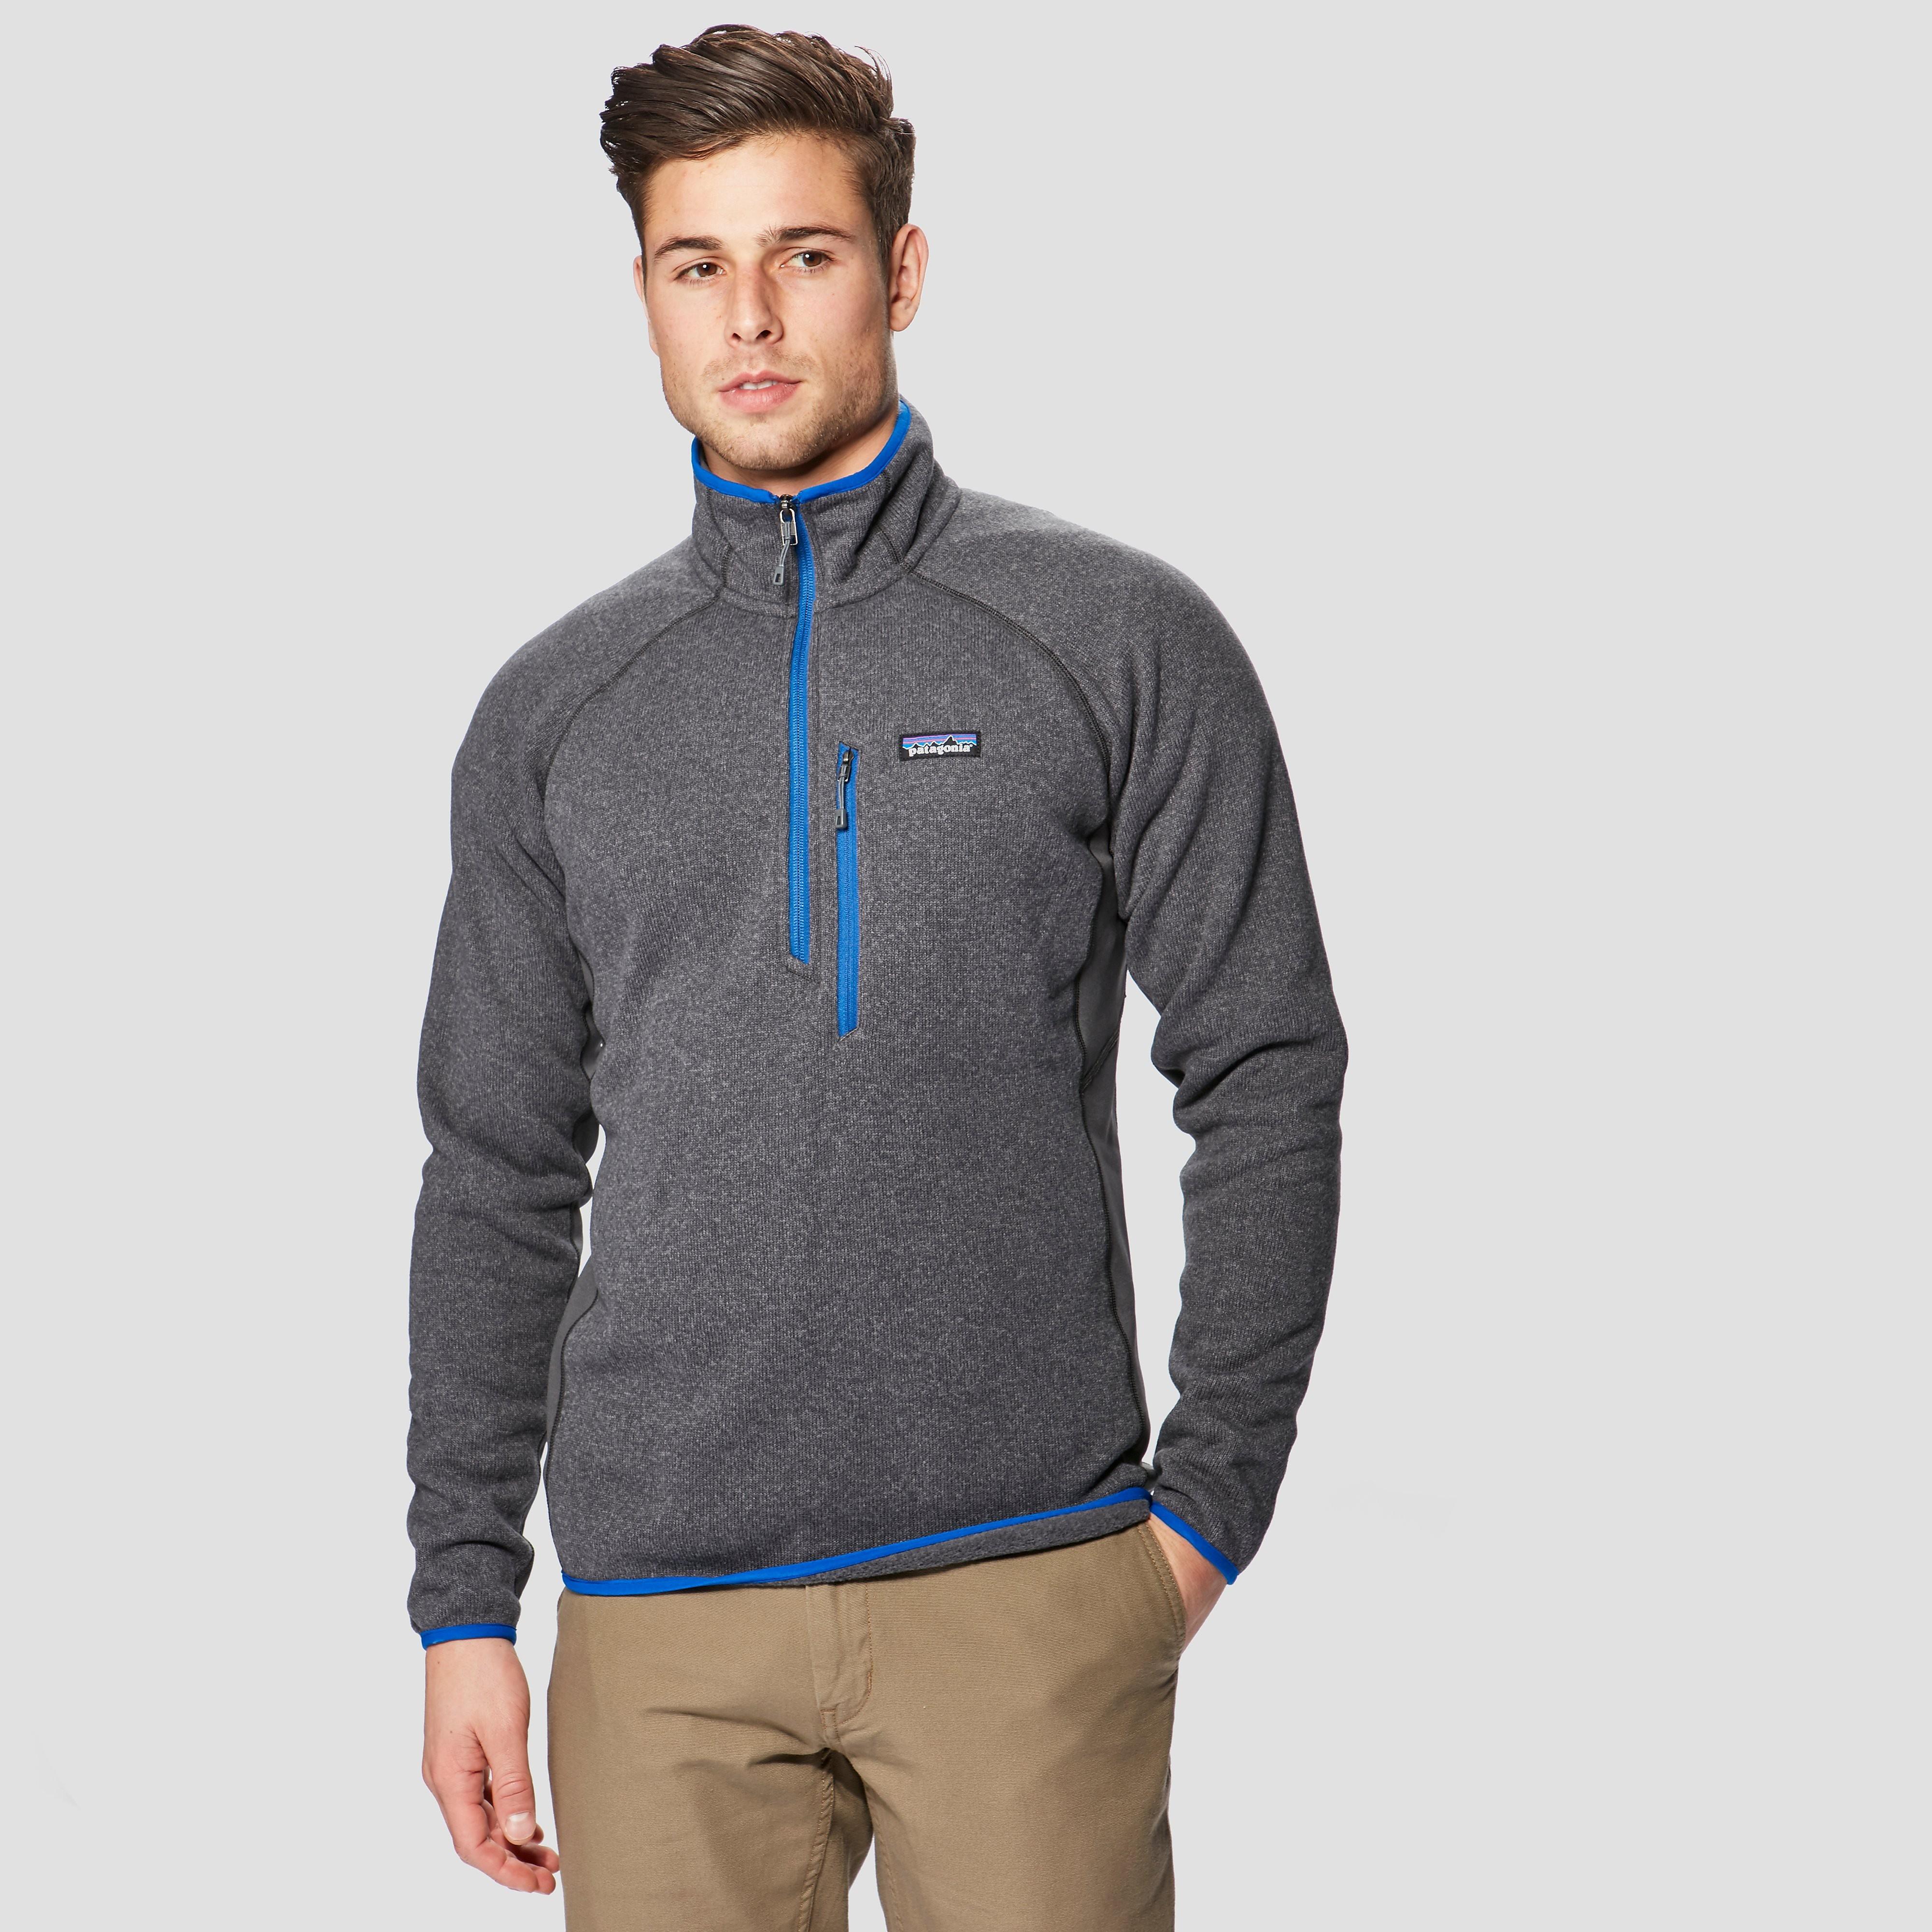 Patagonia 1/4 Zip Performance Better Men's Sweater